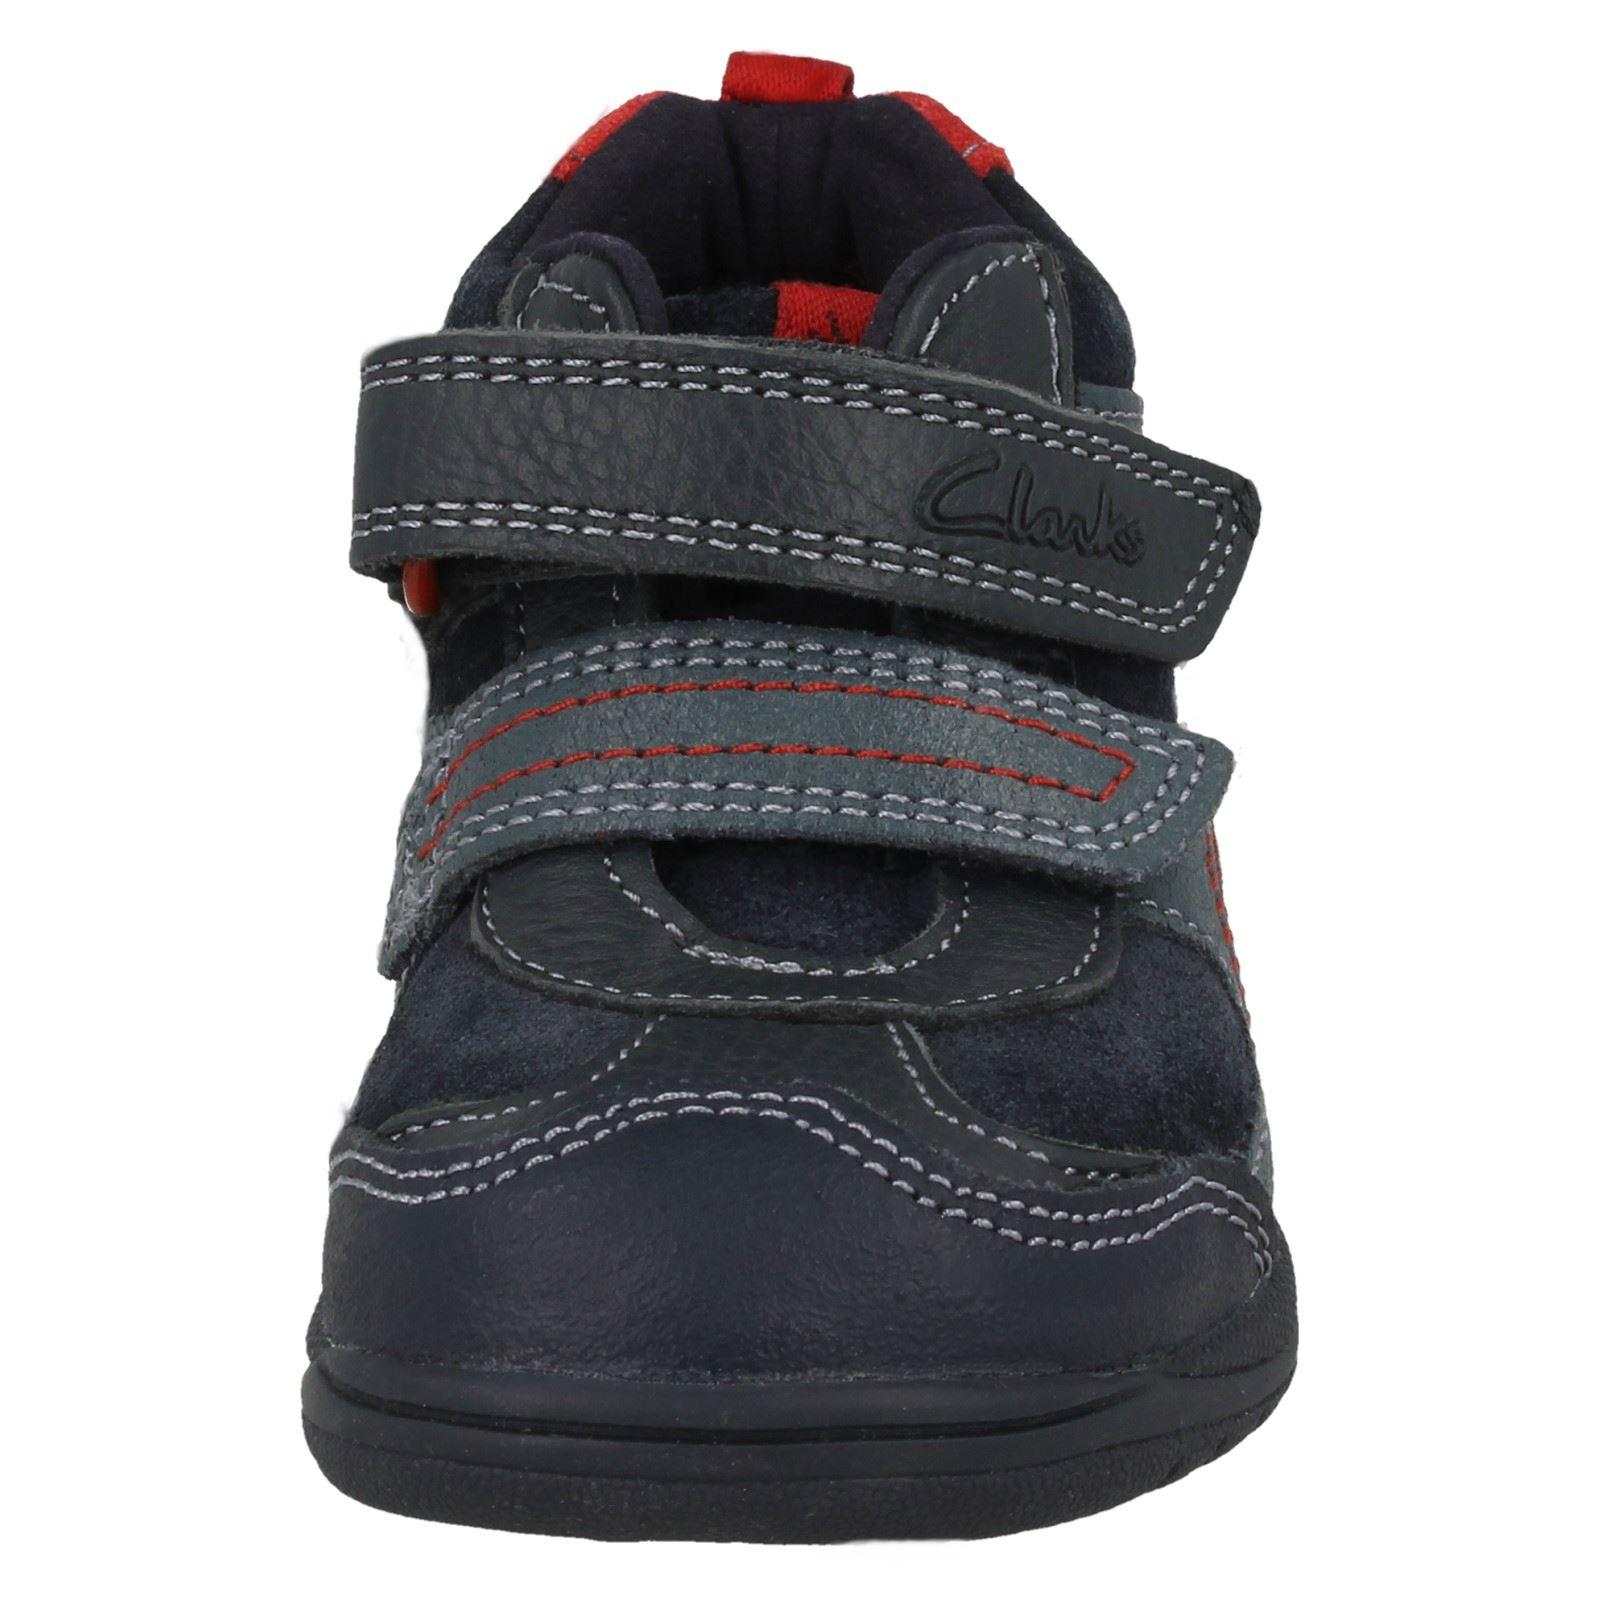 Toddler Clarks Boys Casual Leather Hook & Loop Riptape Boot - Ru Rockshi